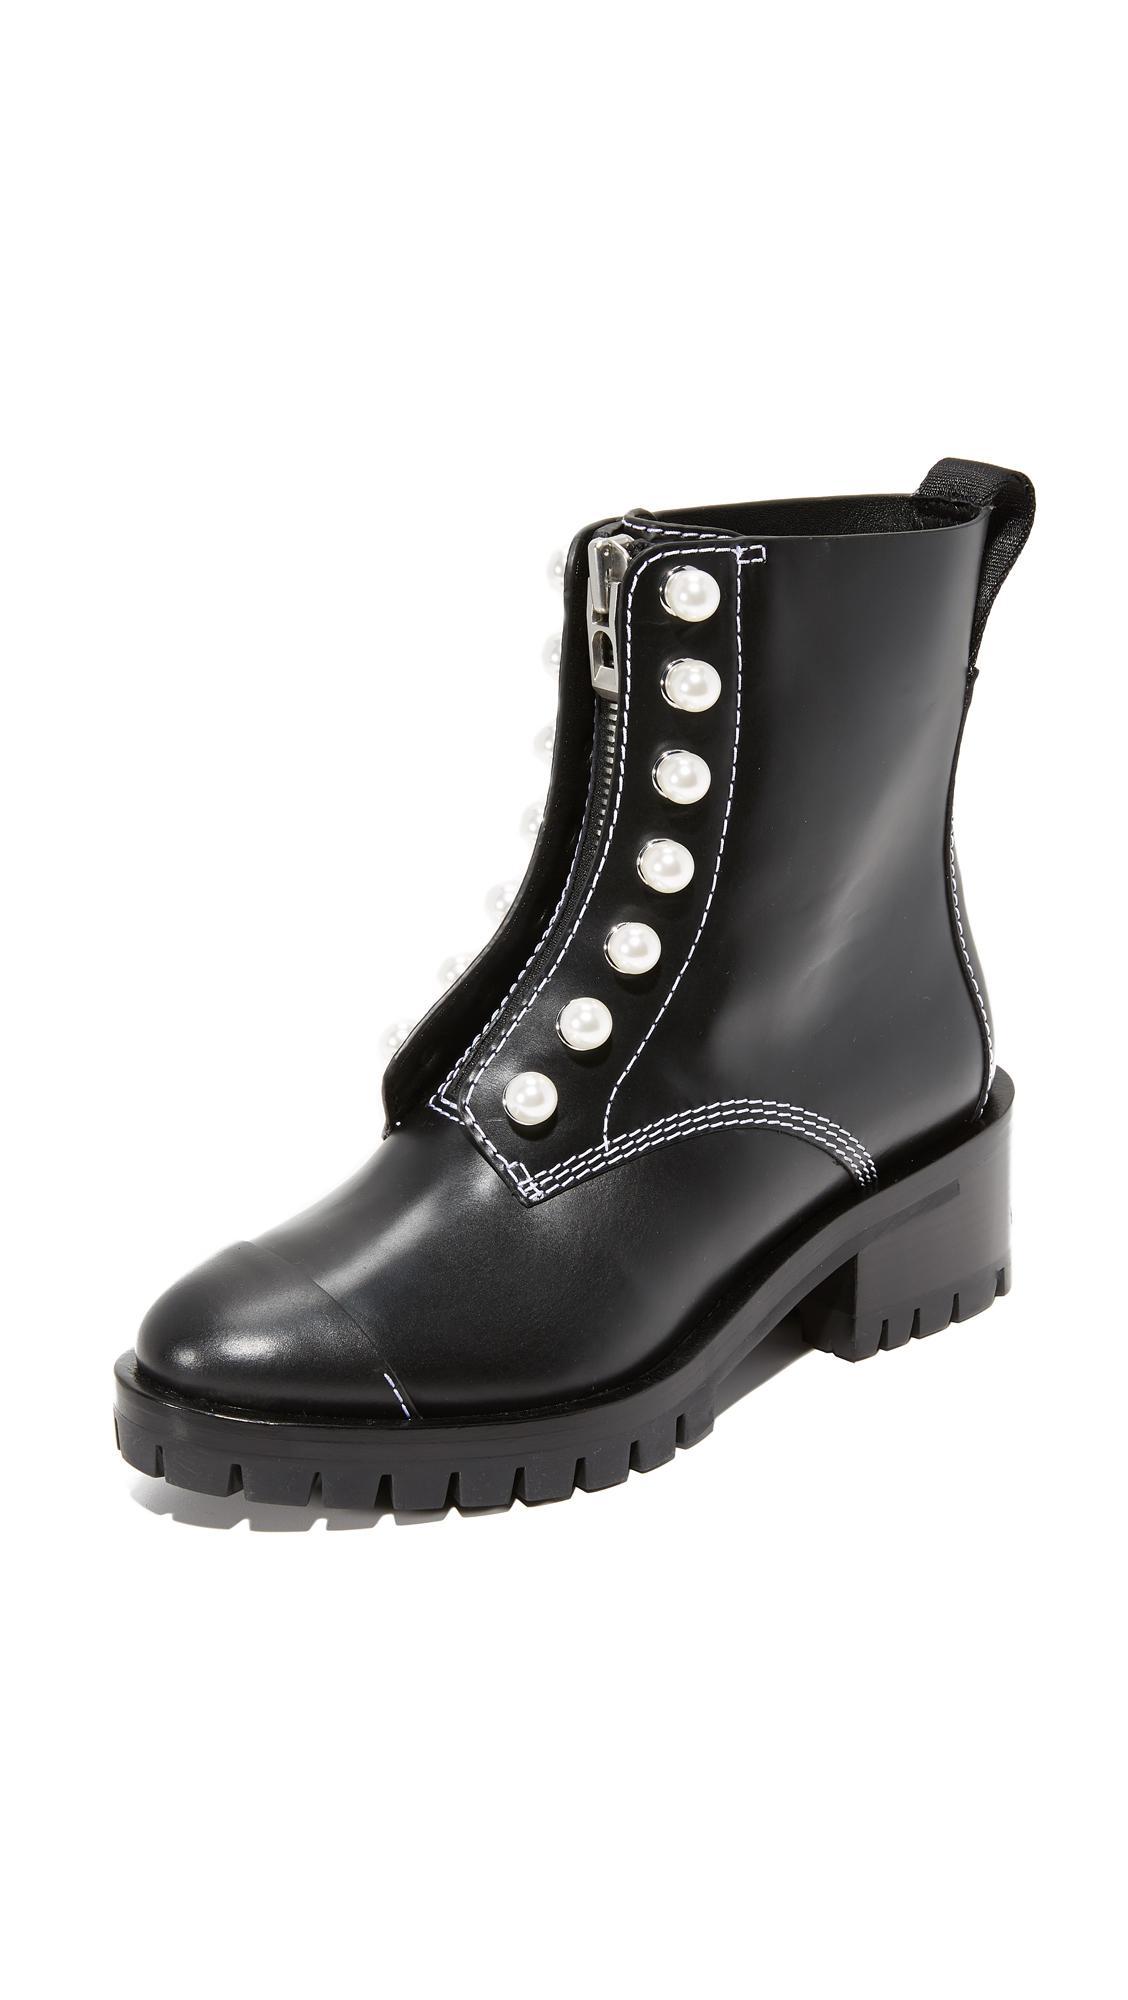 3.1 Phillip Lim Hayett Lug Sole Pearl Boots - Black